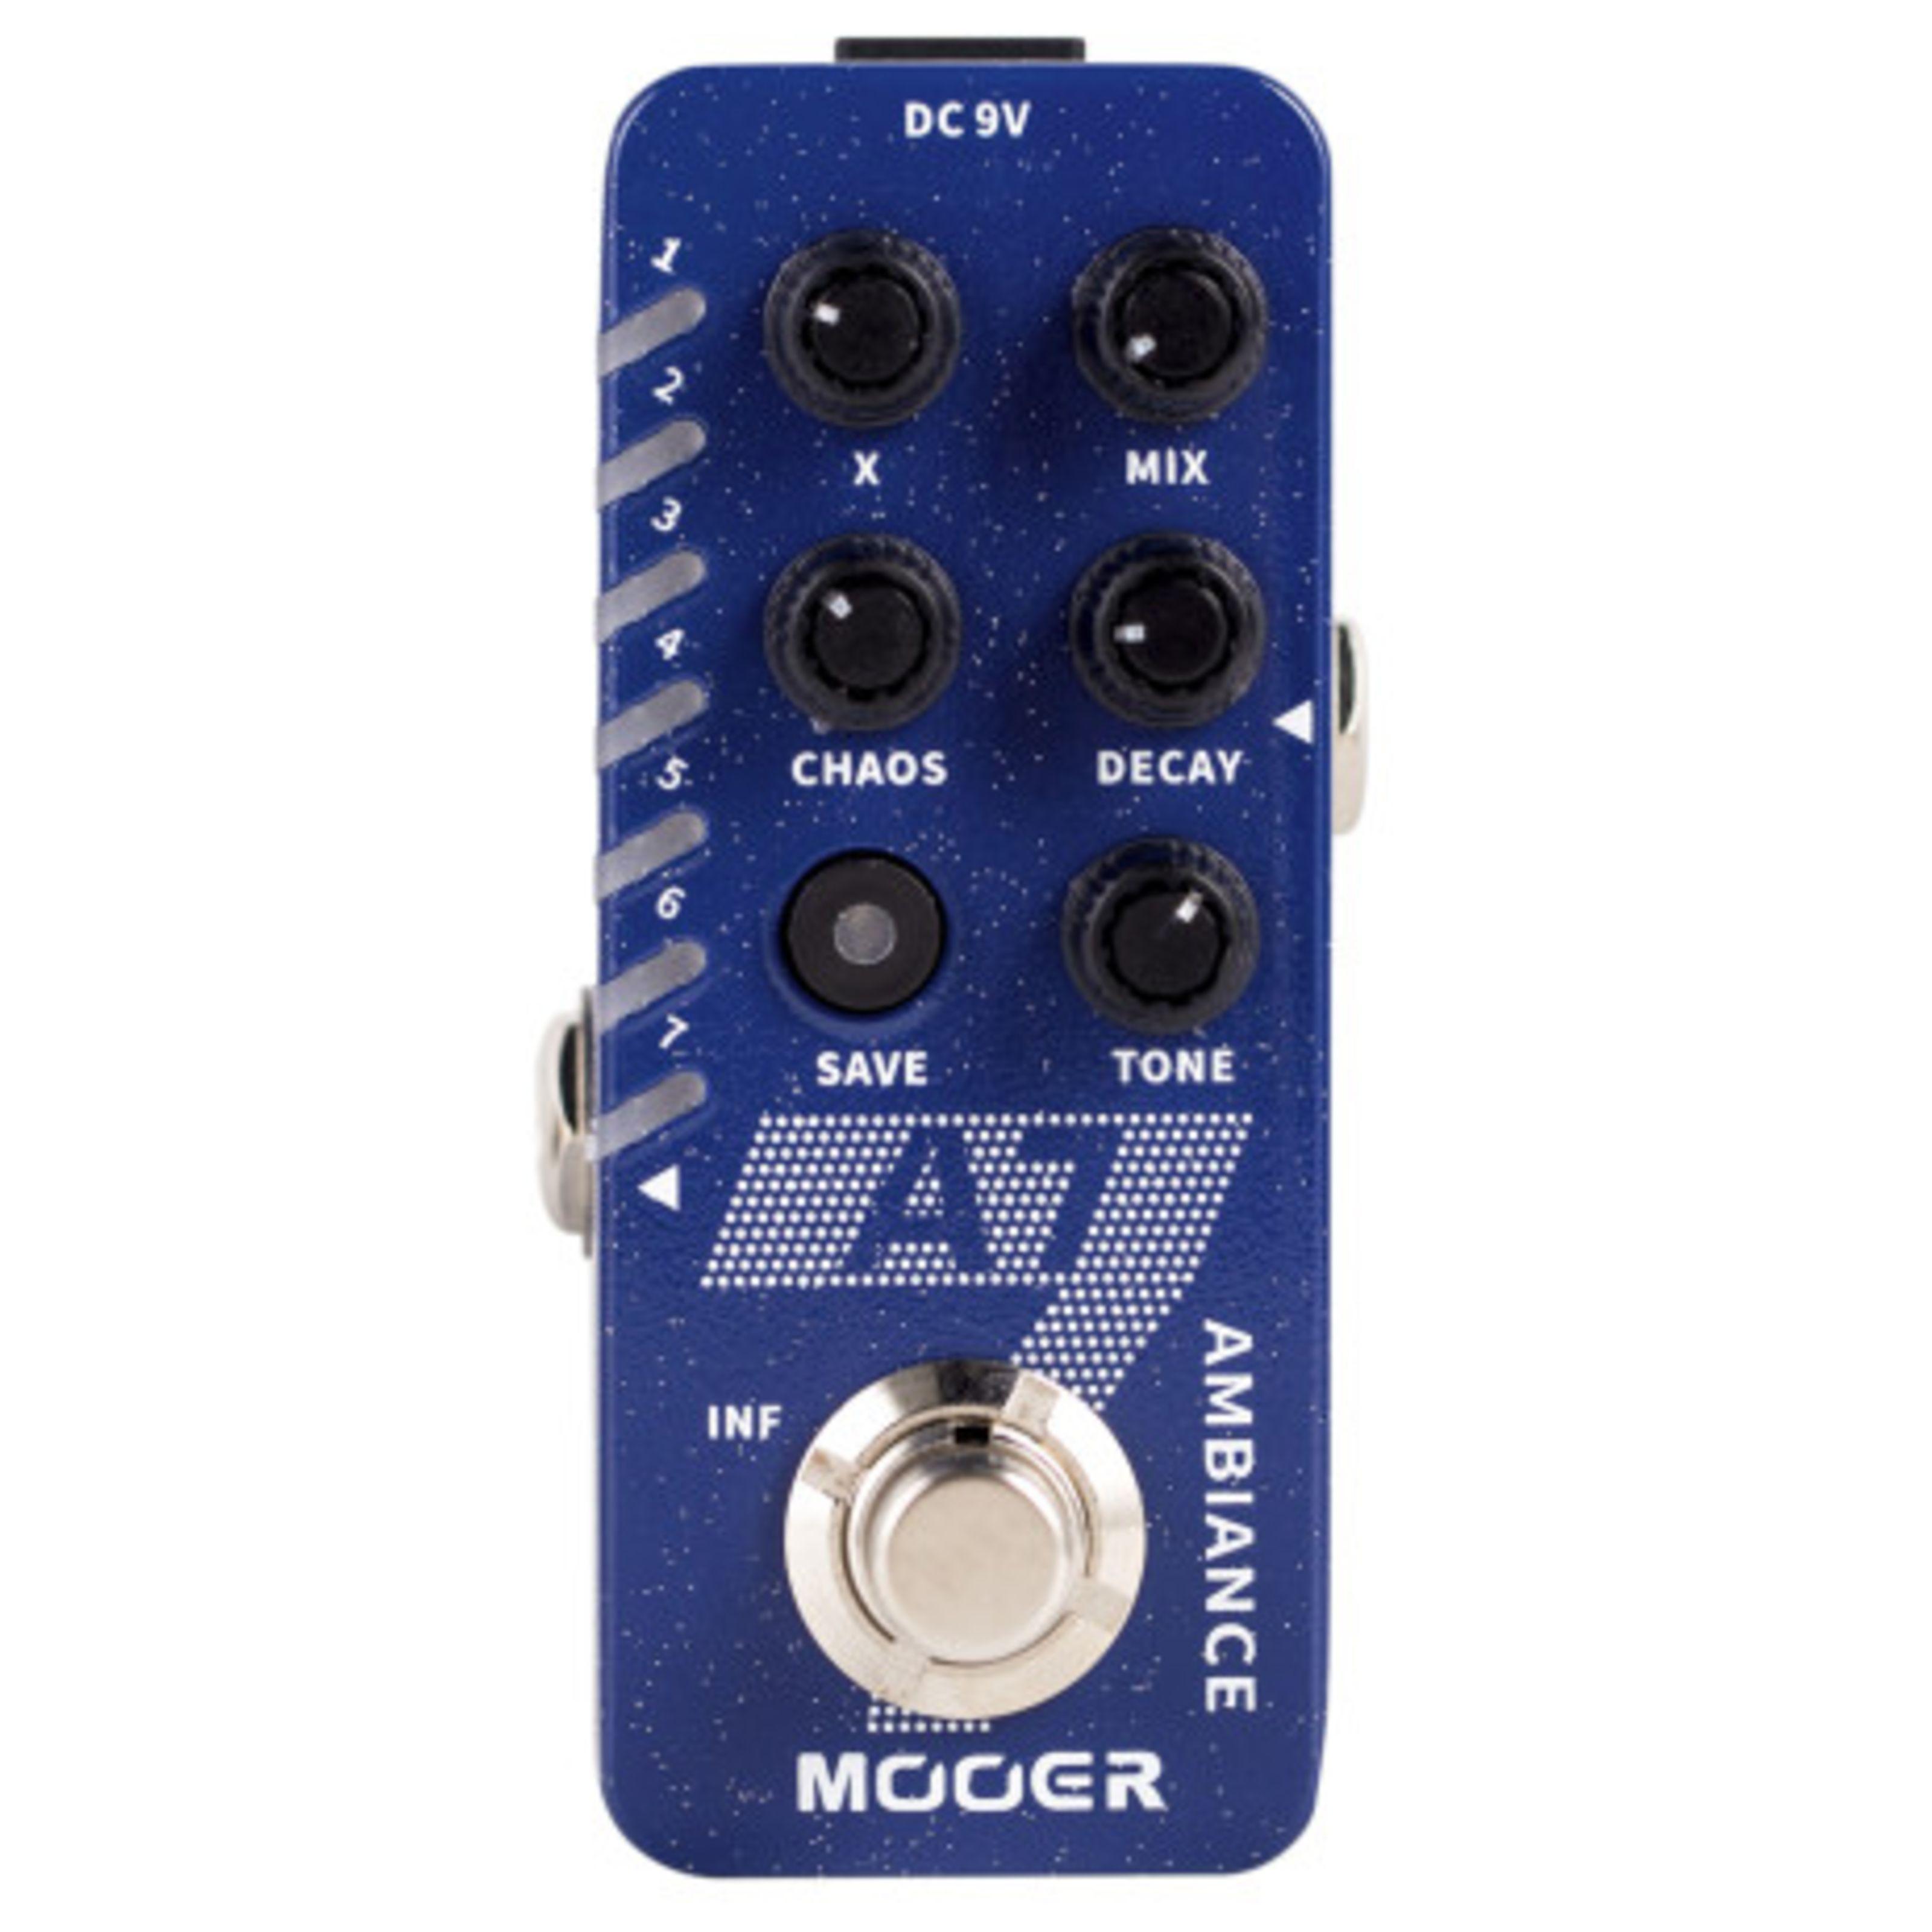 Mooer Audio - A7 Ambiance ME A7 AMBIANCE